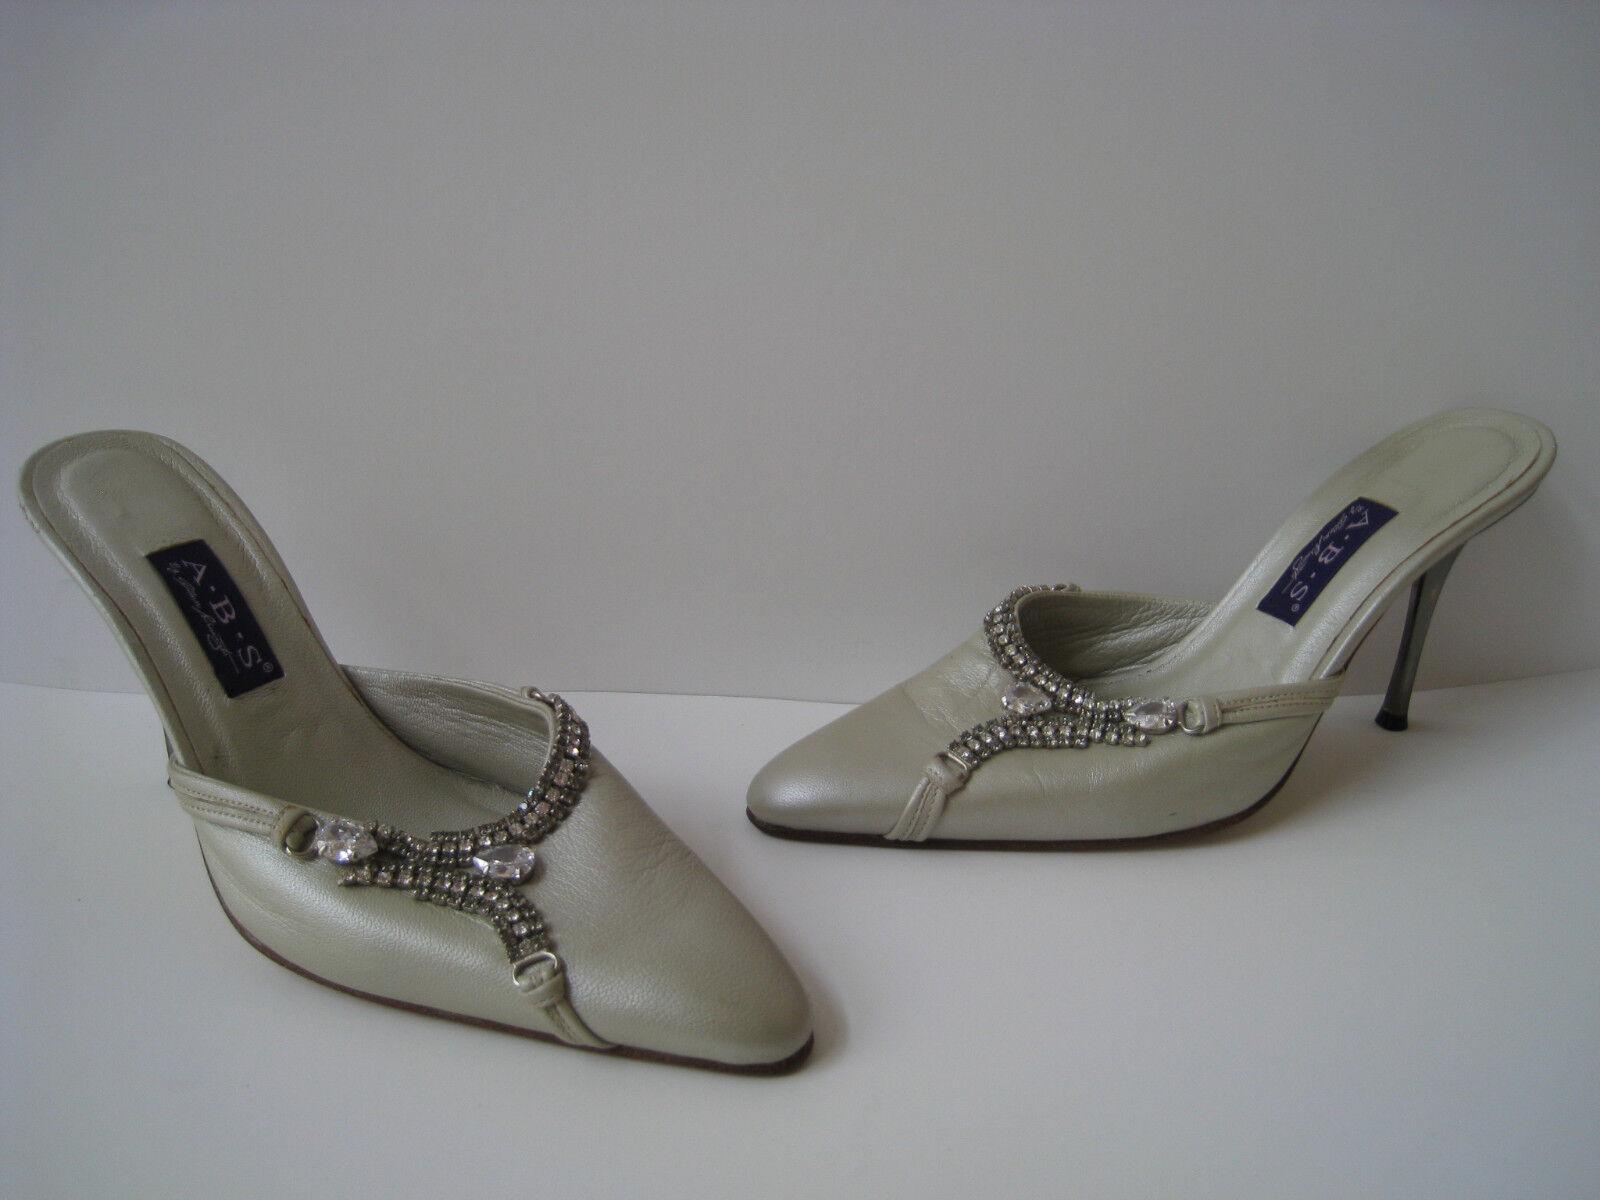 ABS Allen Allen Allen Schwartz gris Cuero Zapatos Stiletto Cristales Formal tamaño nos 8 EUR 38  bienvenido a orden